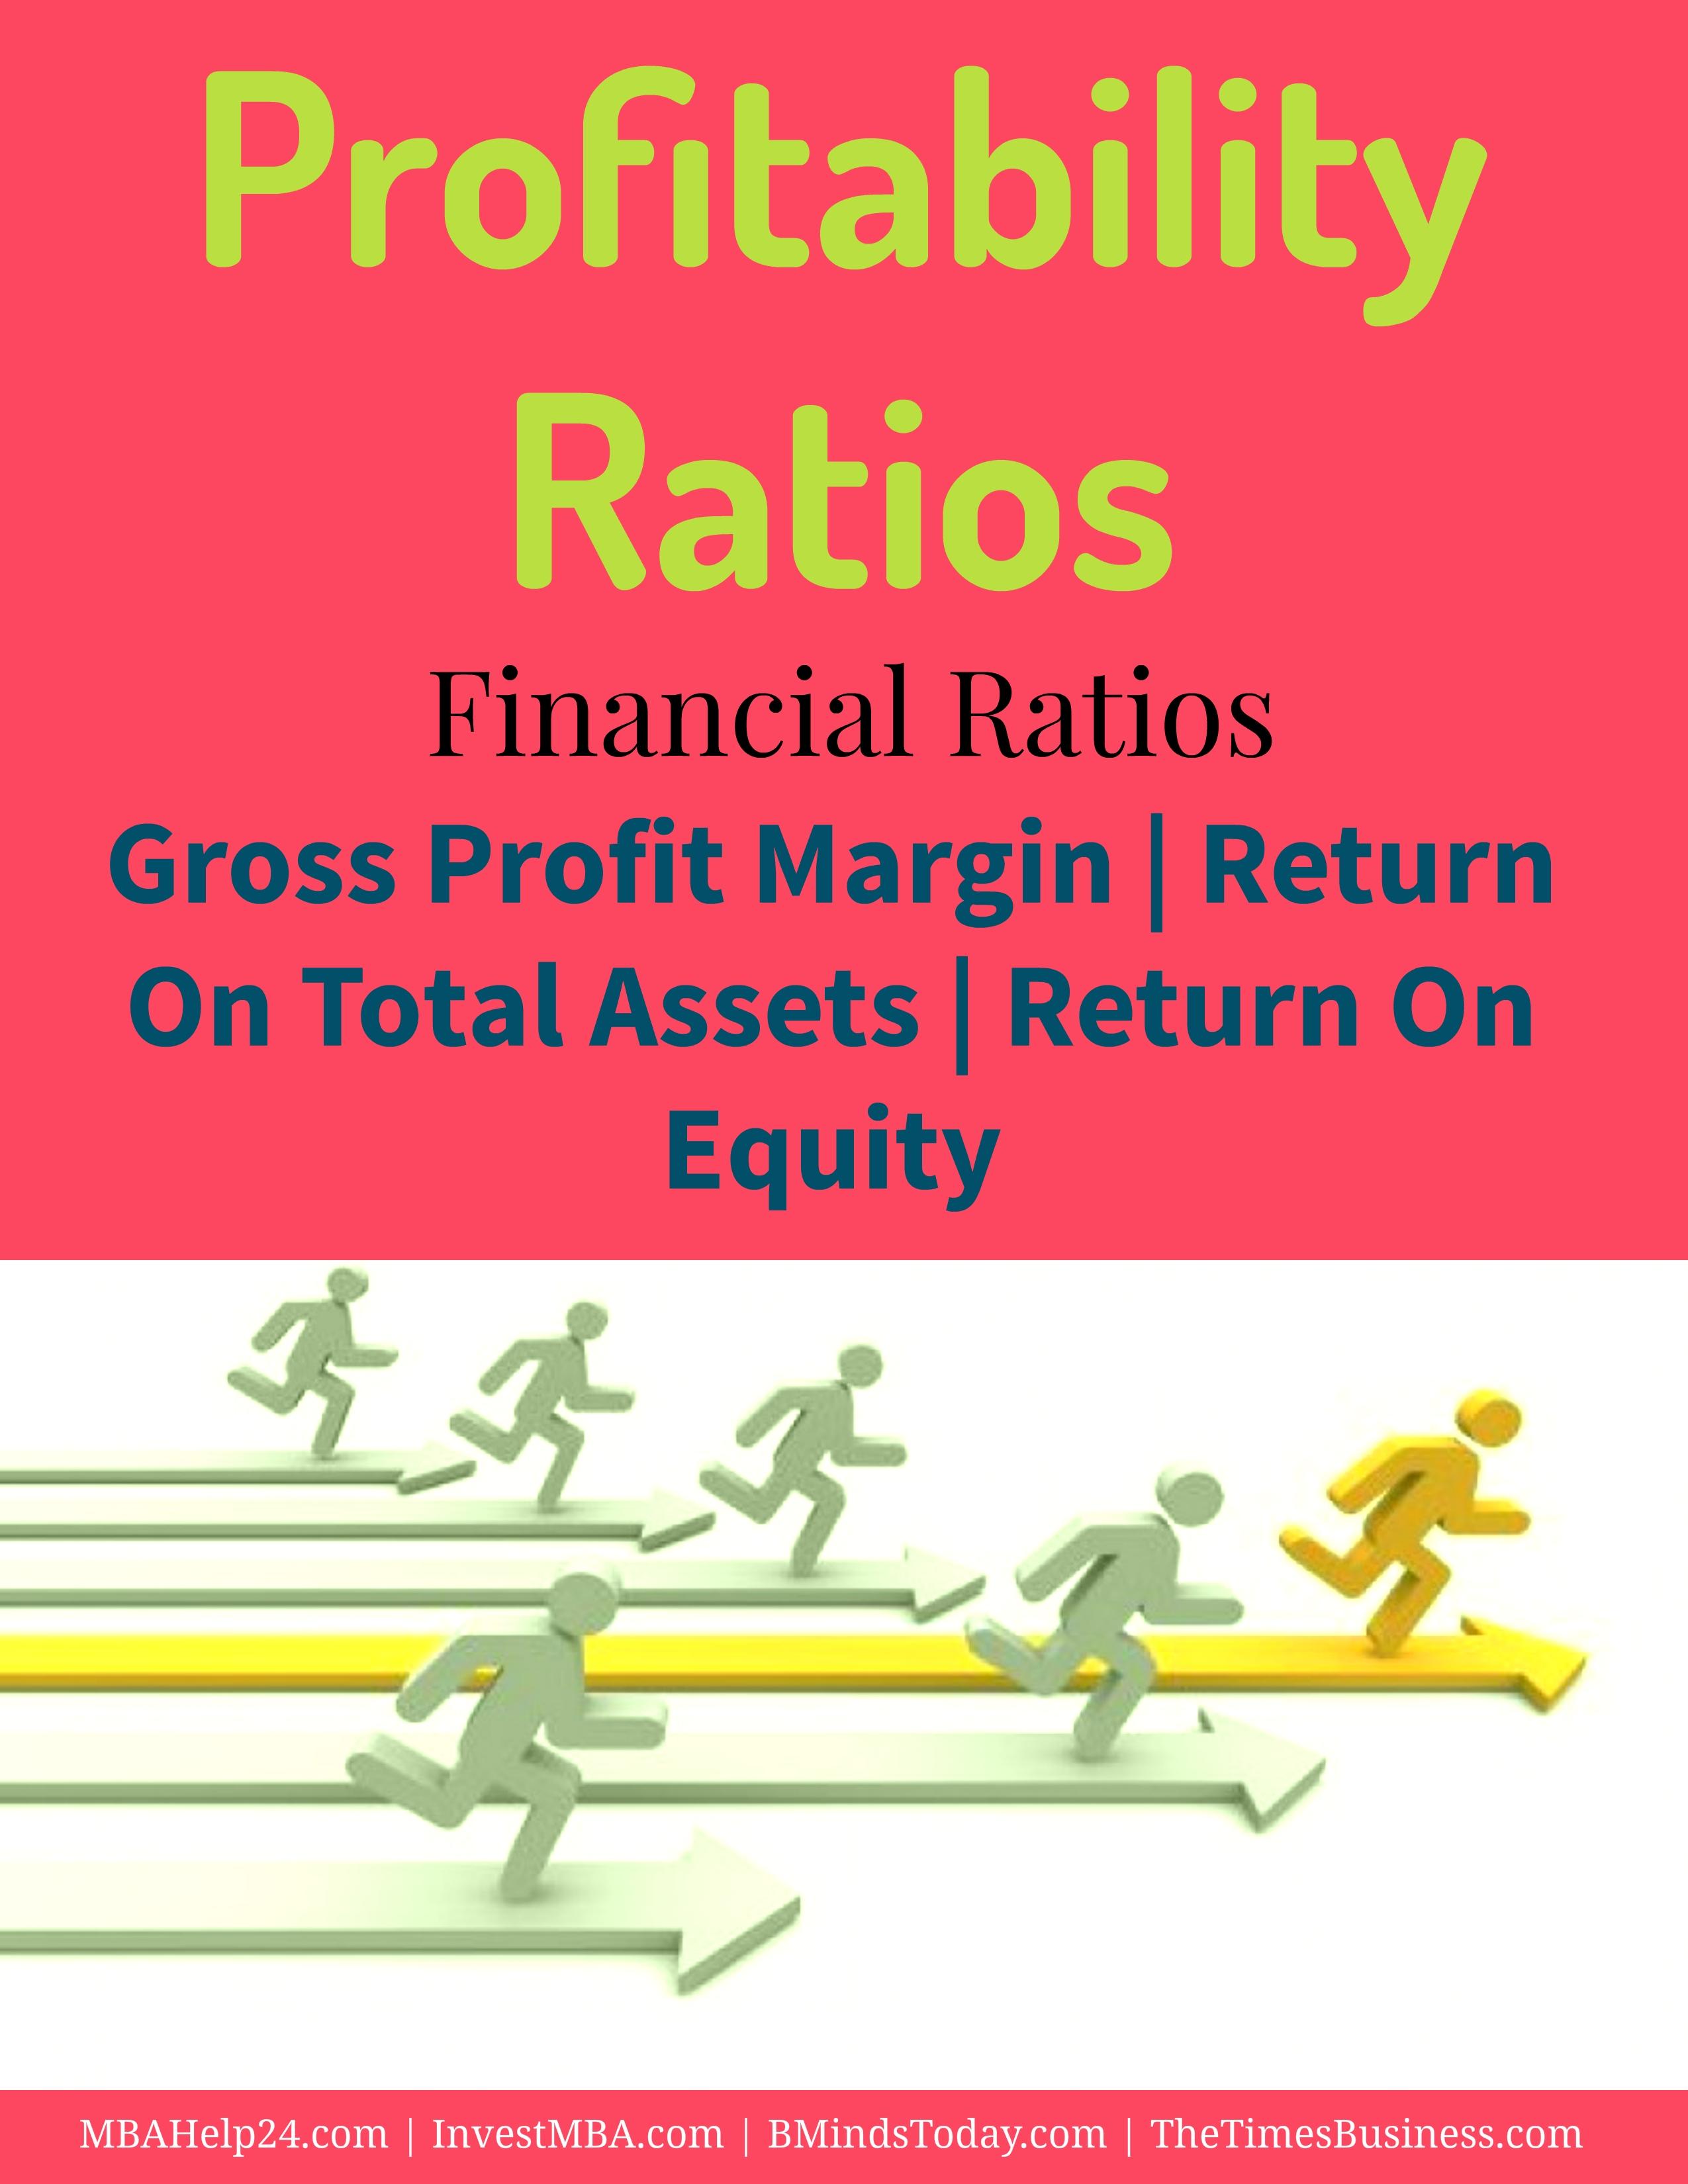 Profitability Ratios- Gross Profit Margin- Return On Assets- Return On Equity Profitability Ratios Profitability Ratios | Gross Profit Margin | Return On Assets | Return On Equity Profitability ratios